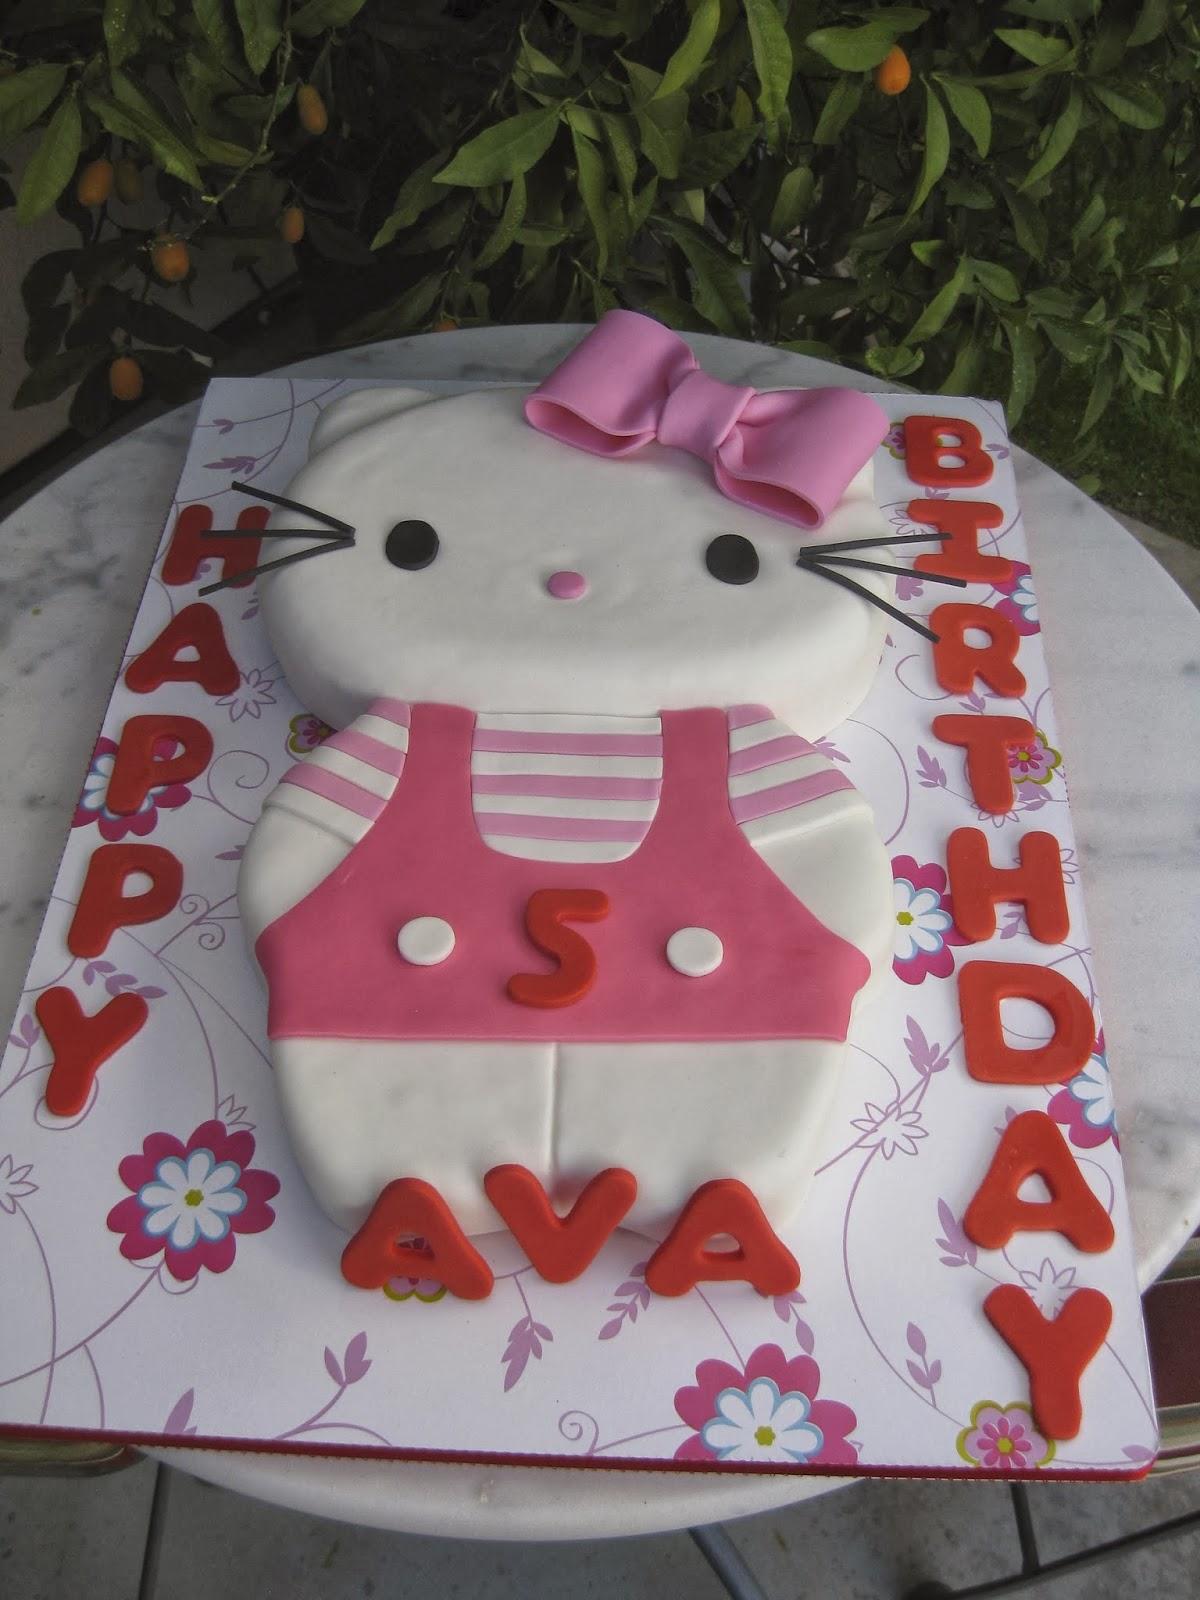 Sugar Chef Ava S 5th Birthday Cake